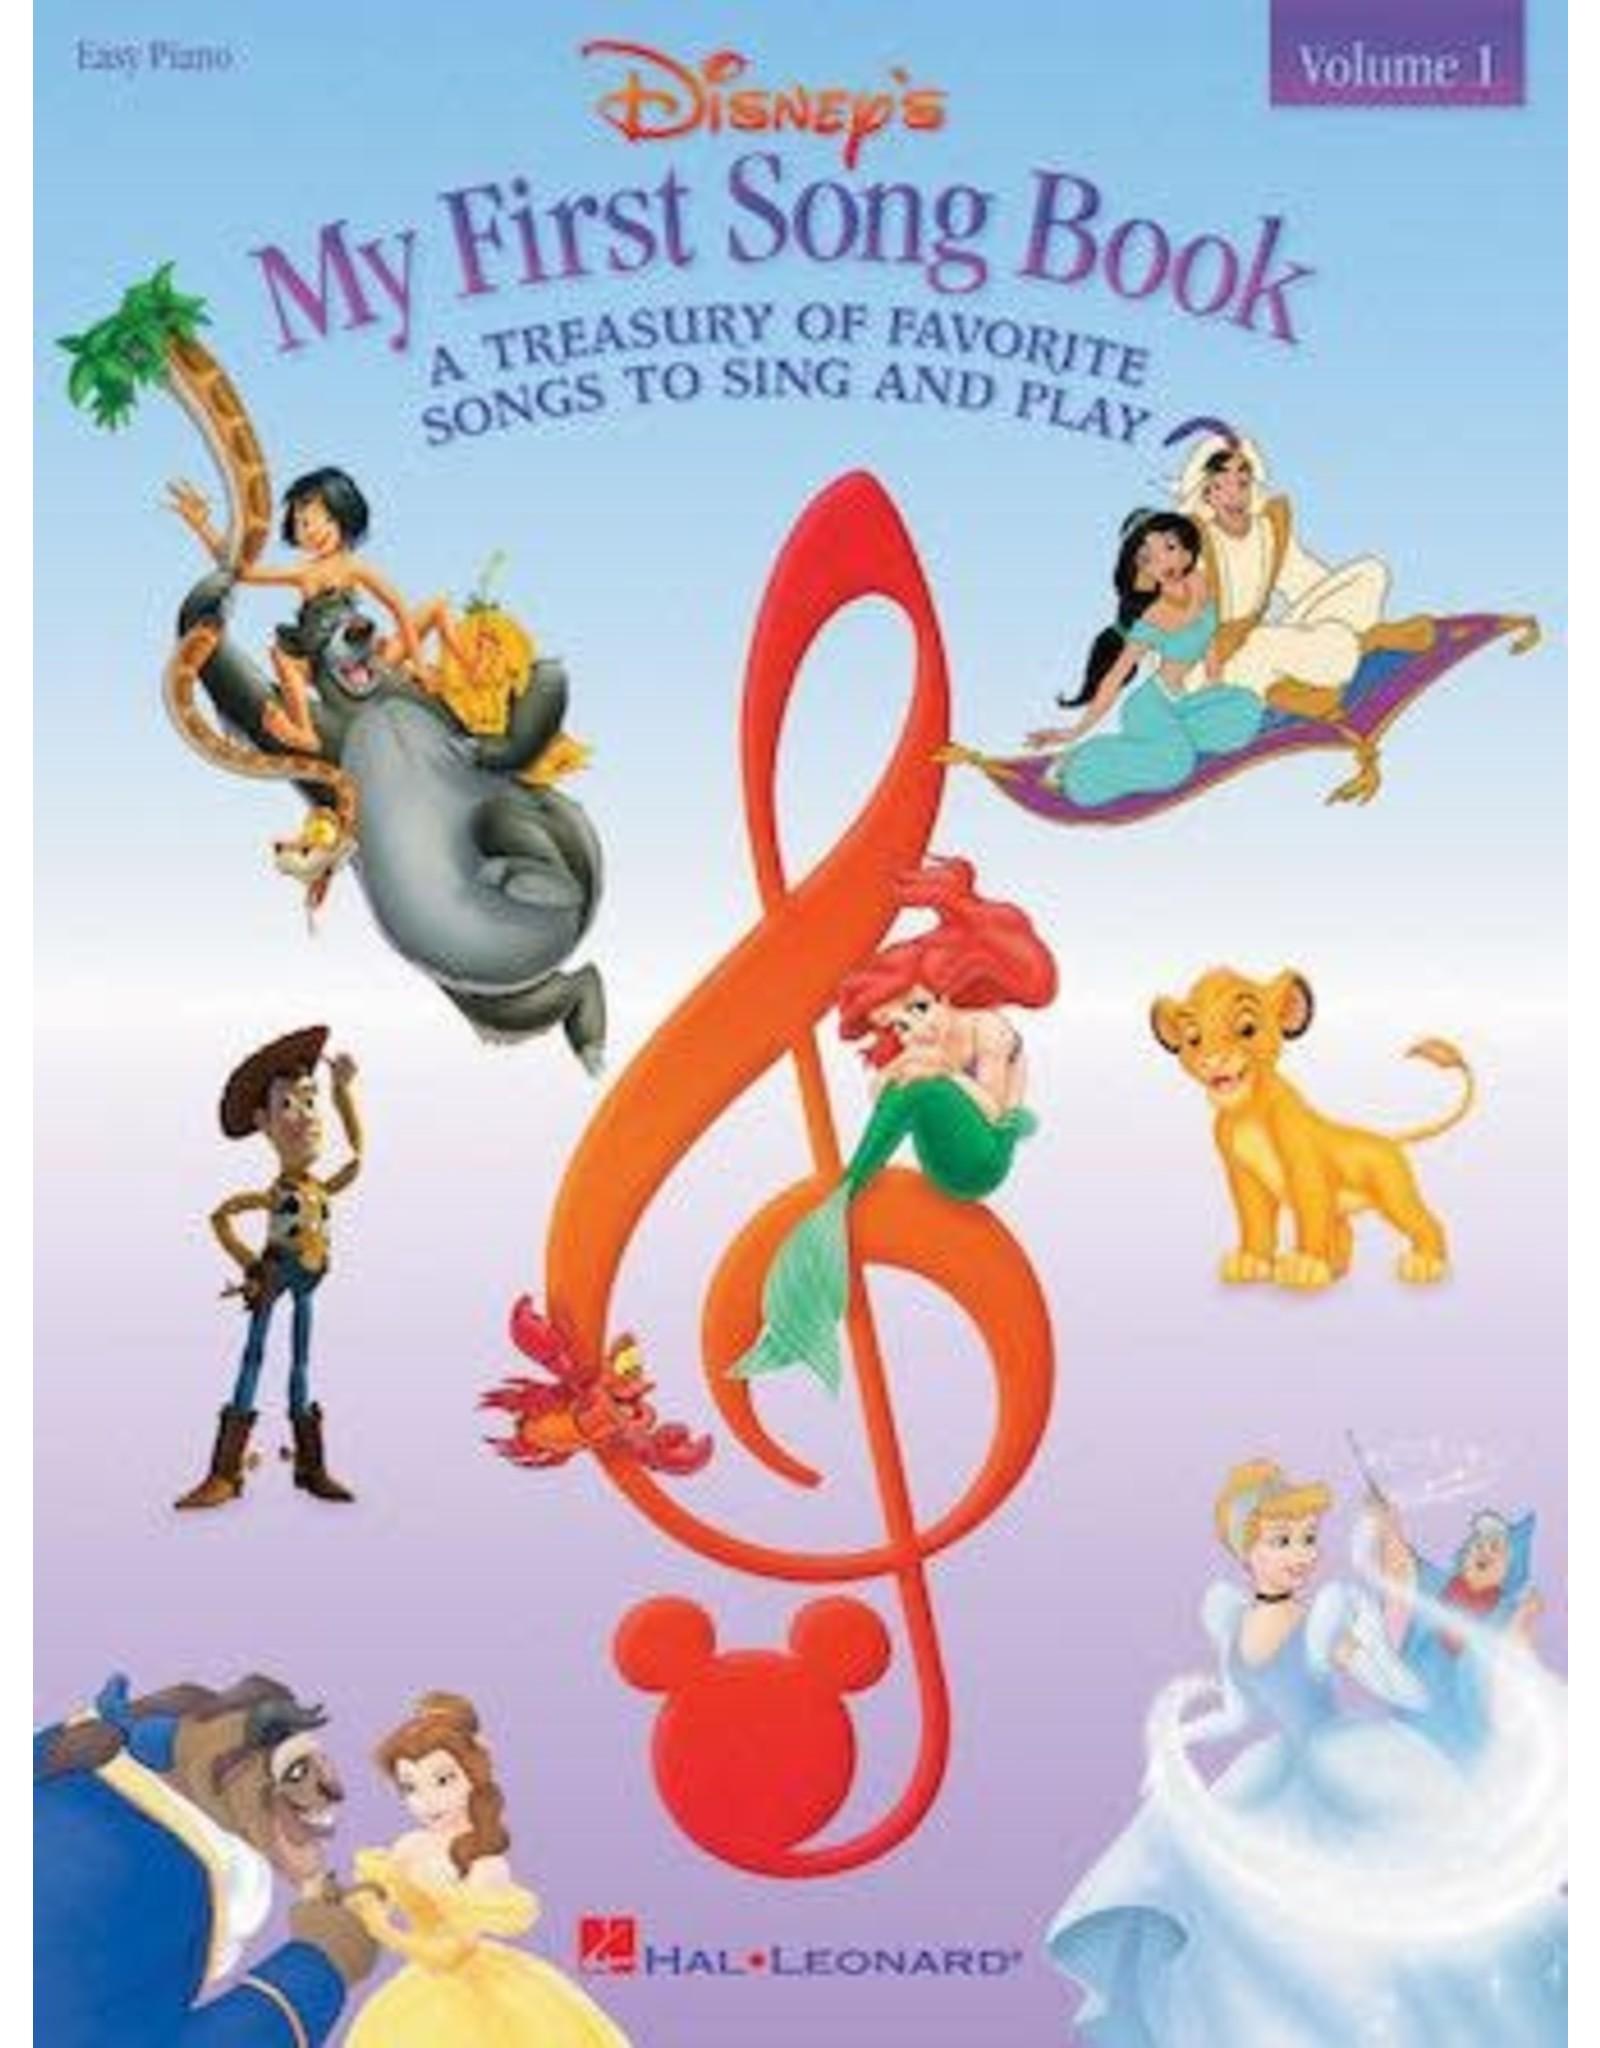 Hal Leonard Disney's My First Songbook Volume 1 - Easy Piano